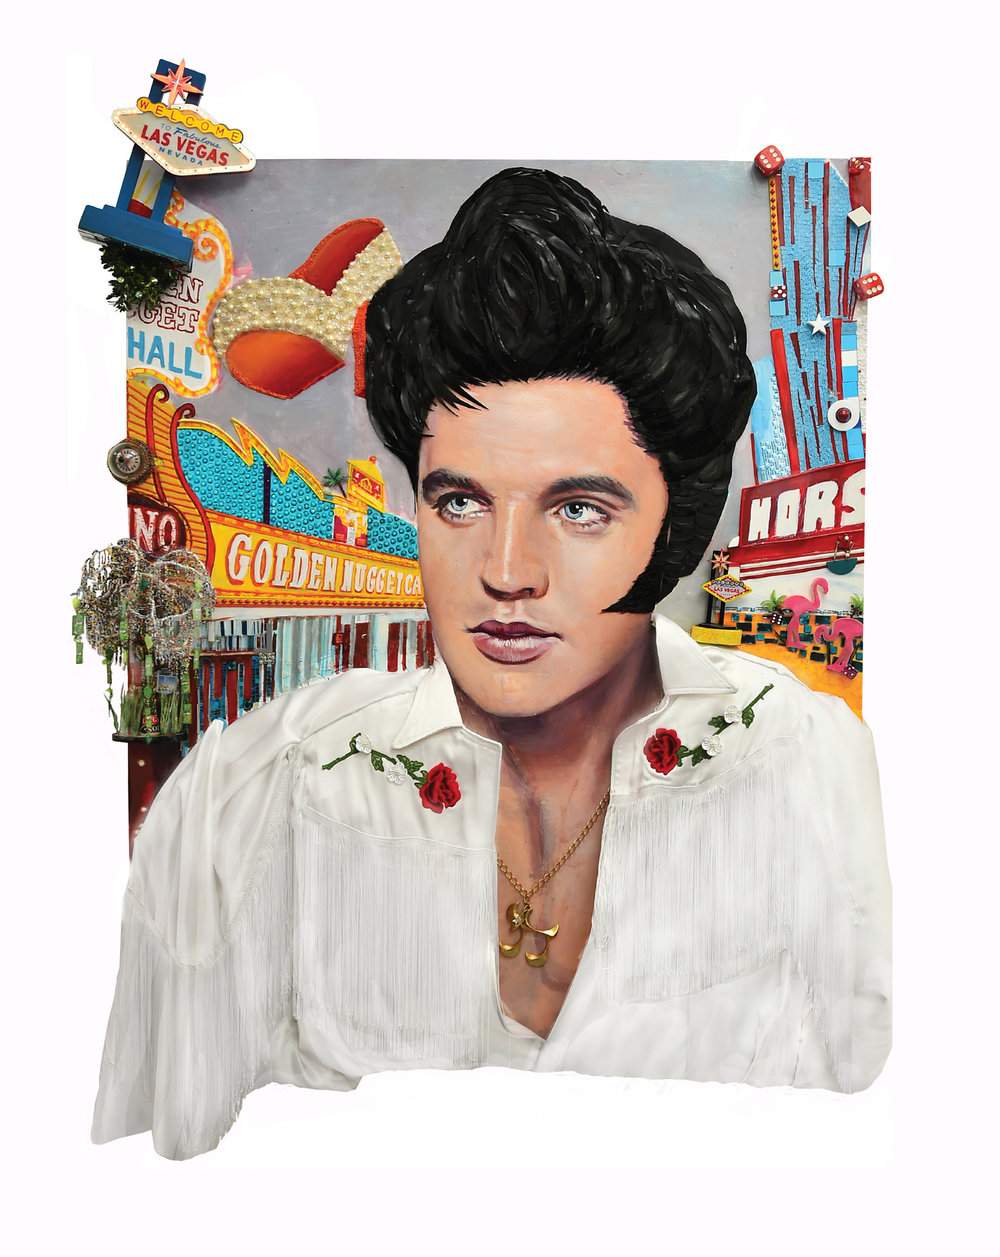 StrosbergMandel-Elvis in Vegas-Metallic print-16 x 20 in.-$750.jpg